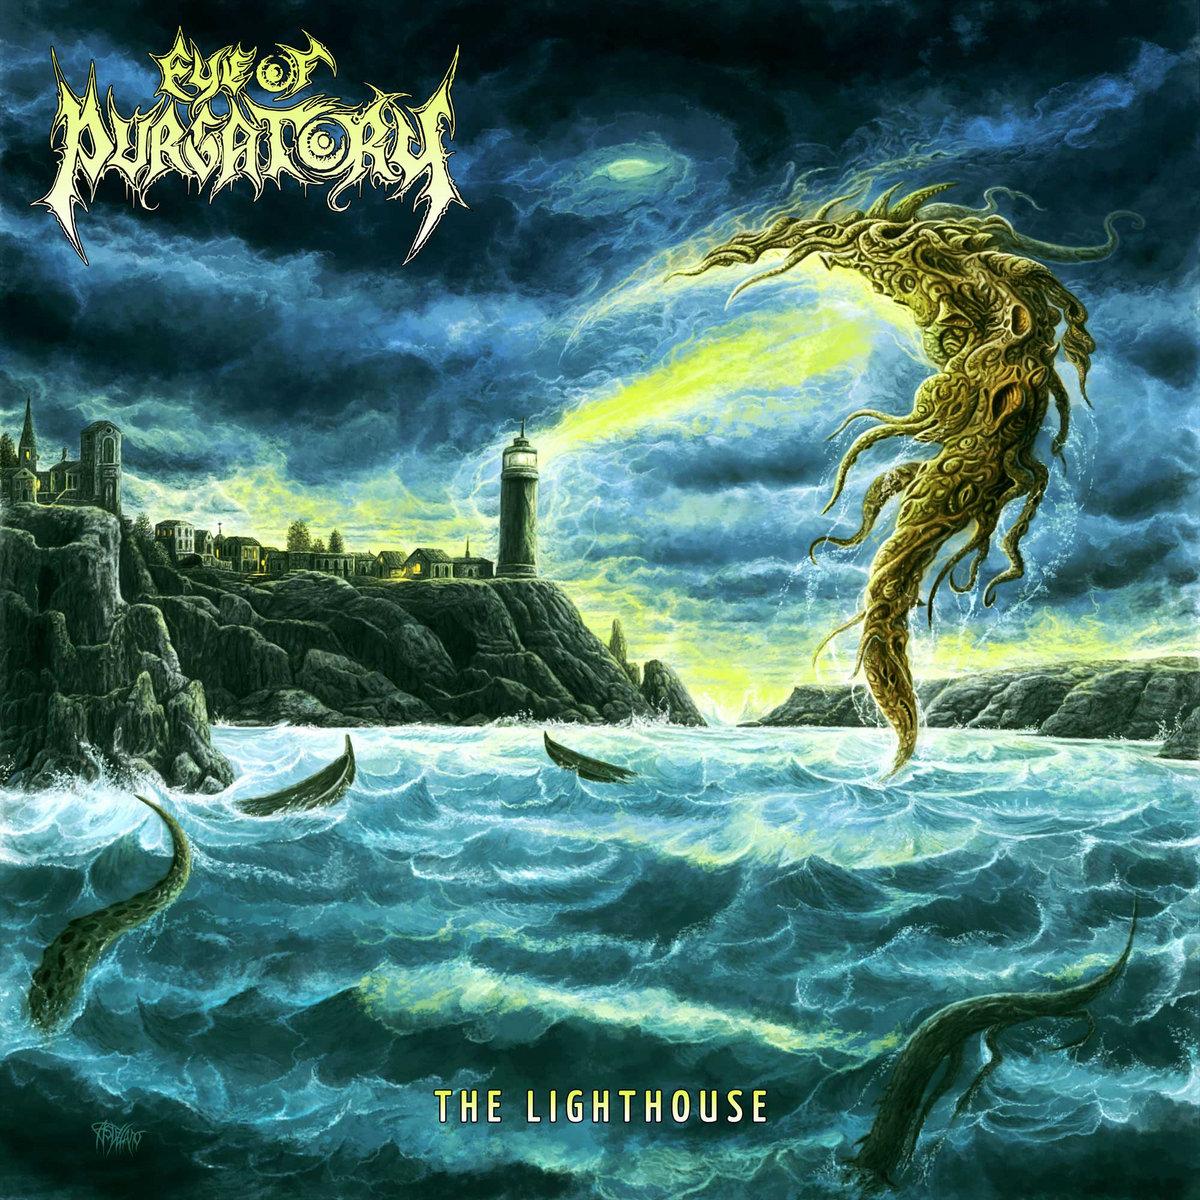 The Lighthouse (Death Metal)   EYE OF PURGATORY (Sweden)   Eye of Purgatory